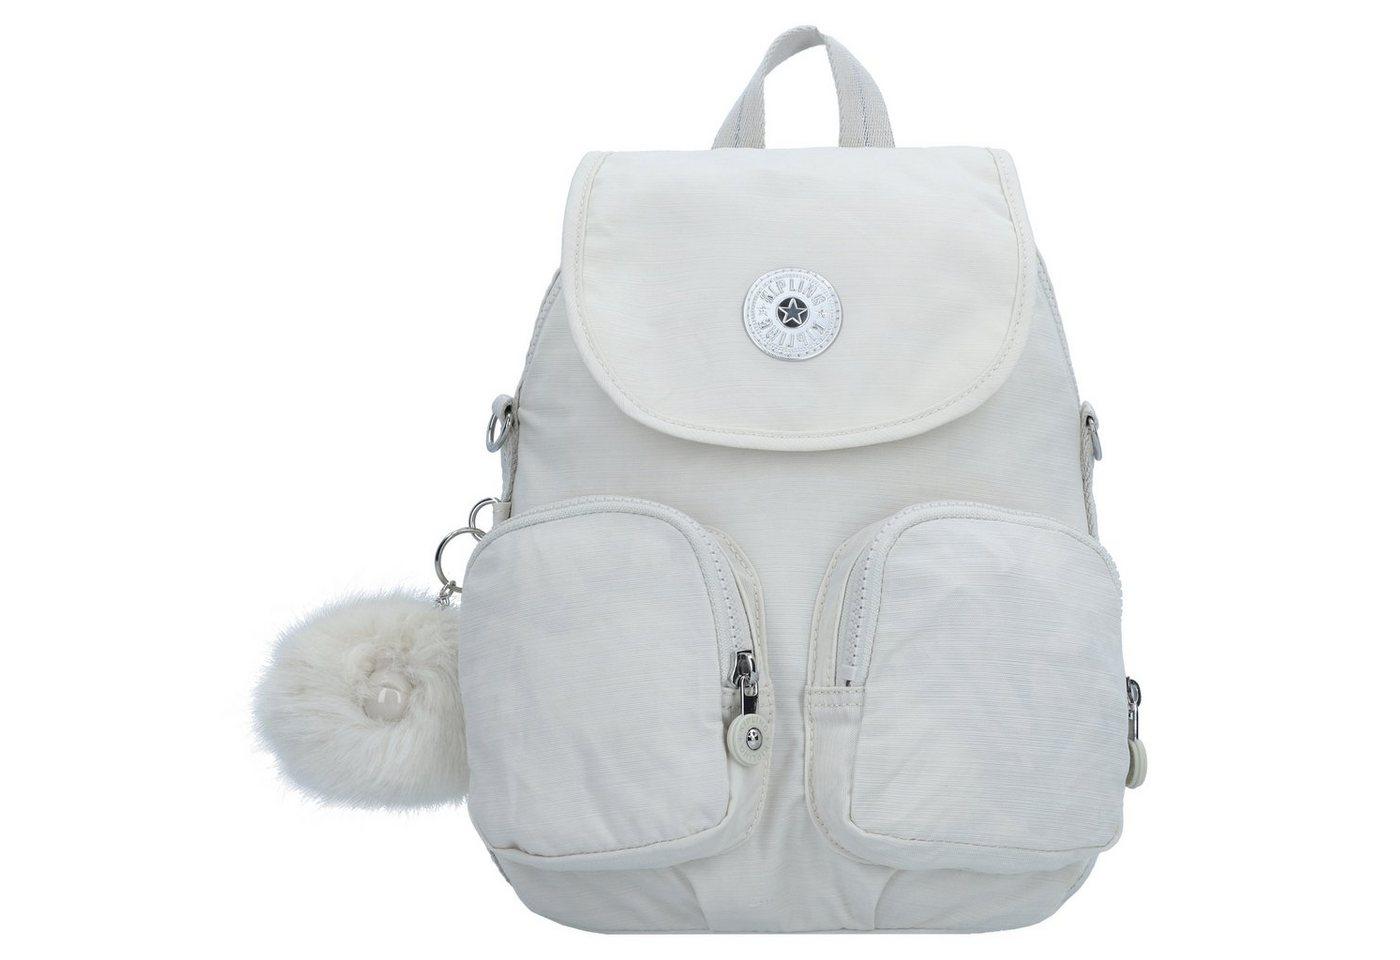 KIPLING Basic Plus City Rucksack 28 cm | Taschen > Rucksäcke | Weiß | KIPLING